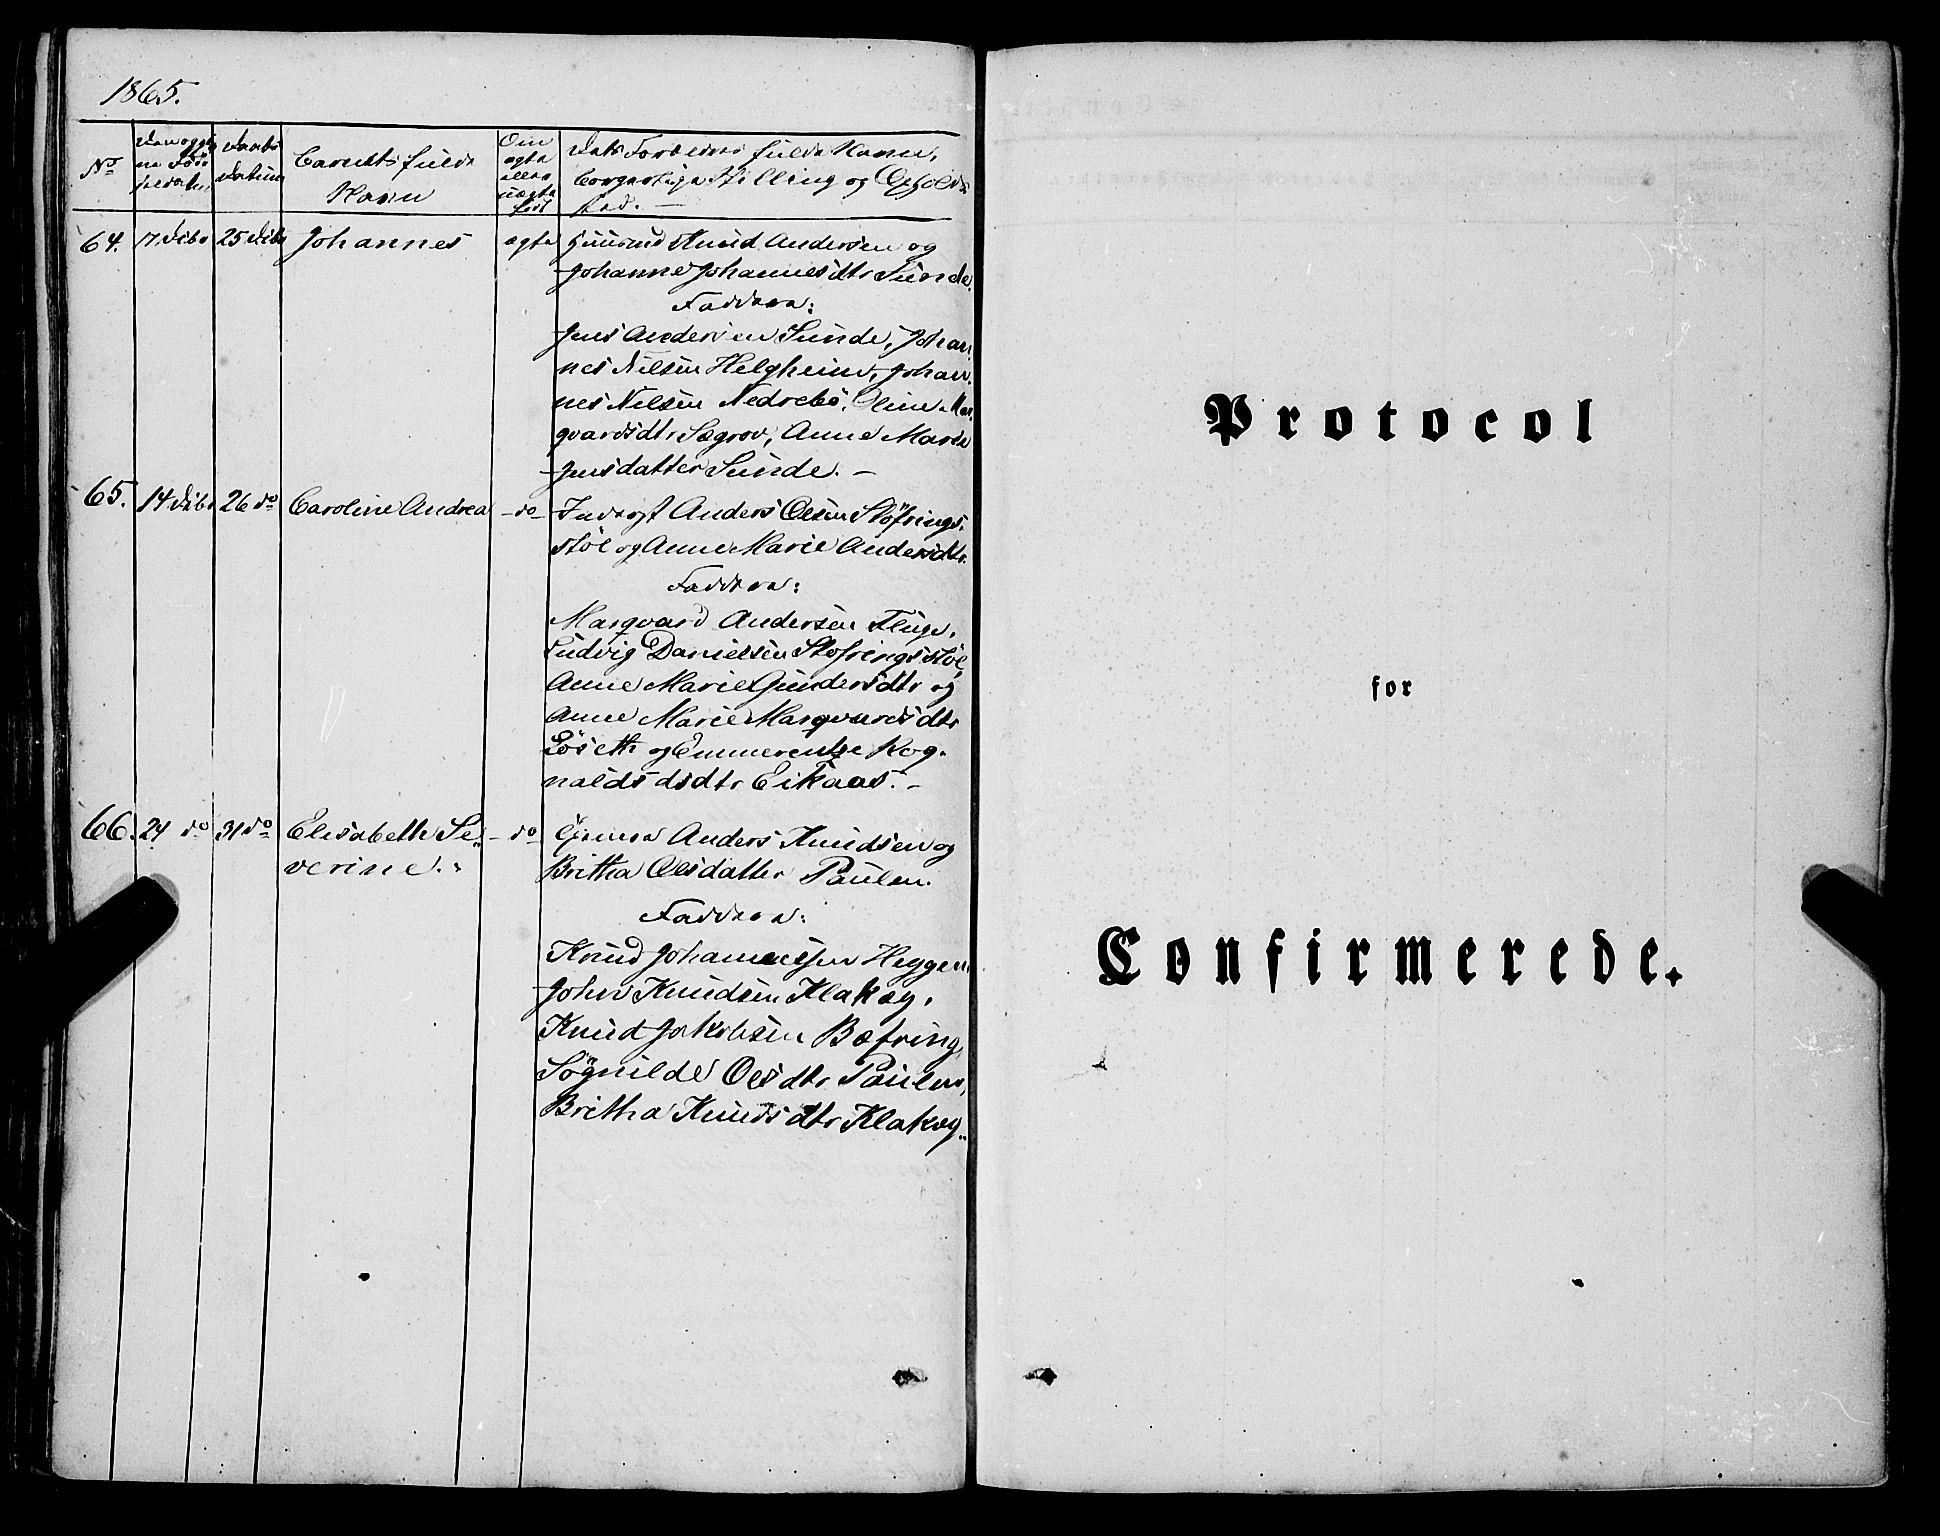 SAB, Jølster Sokneprestembete, H/Haa/Haaa/L0010: Ministerialbok nr. A 10, 1847-1865